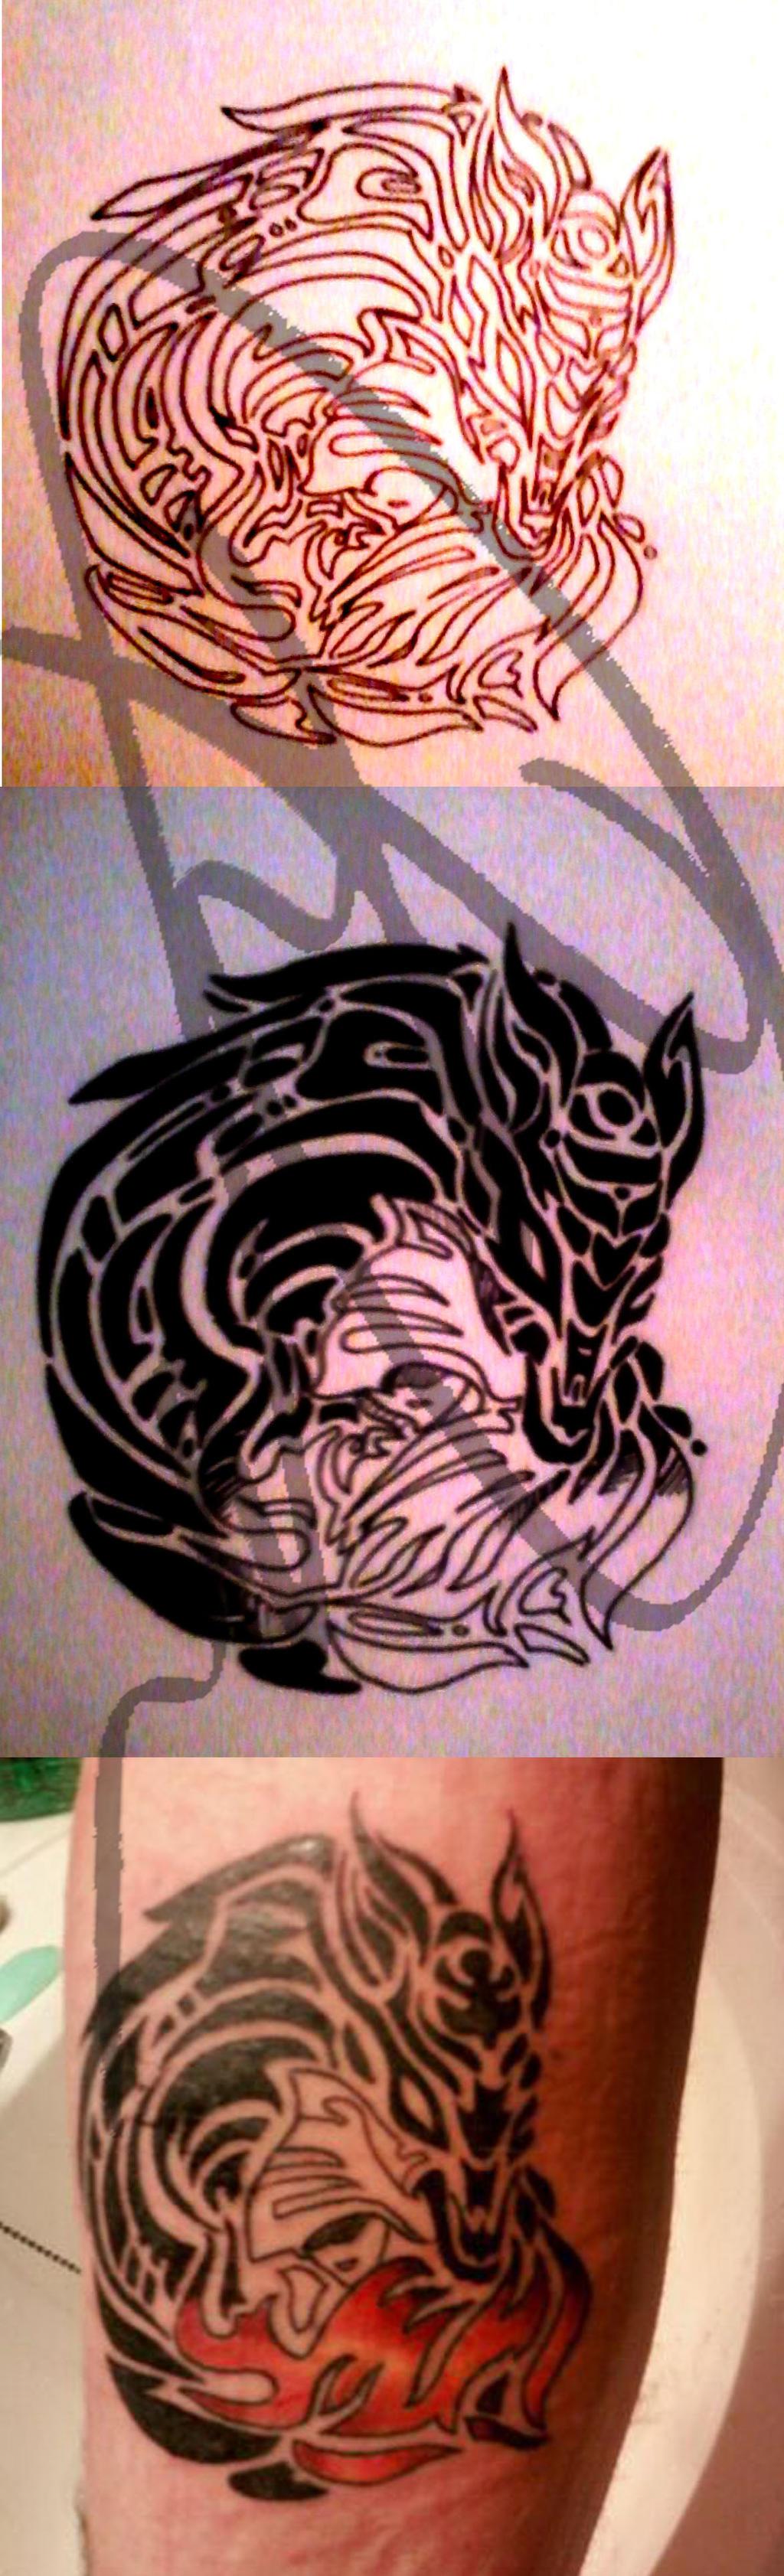 red riding hood tattoo by crescent moon demon on deviantart. Black Bedroom Furniture Sets. Home Design Ideas